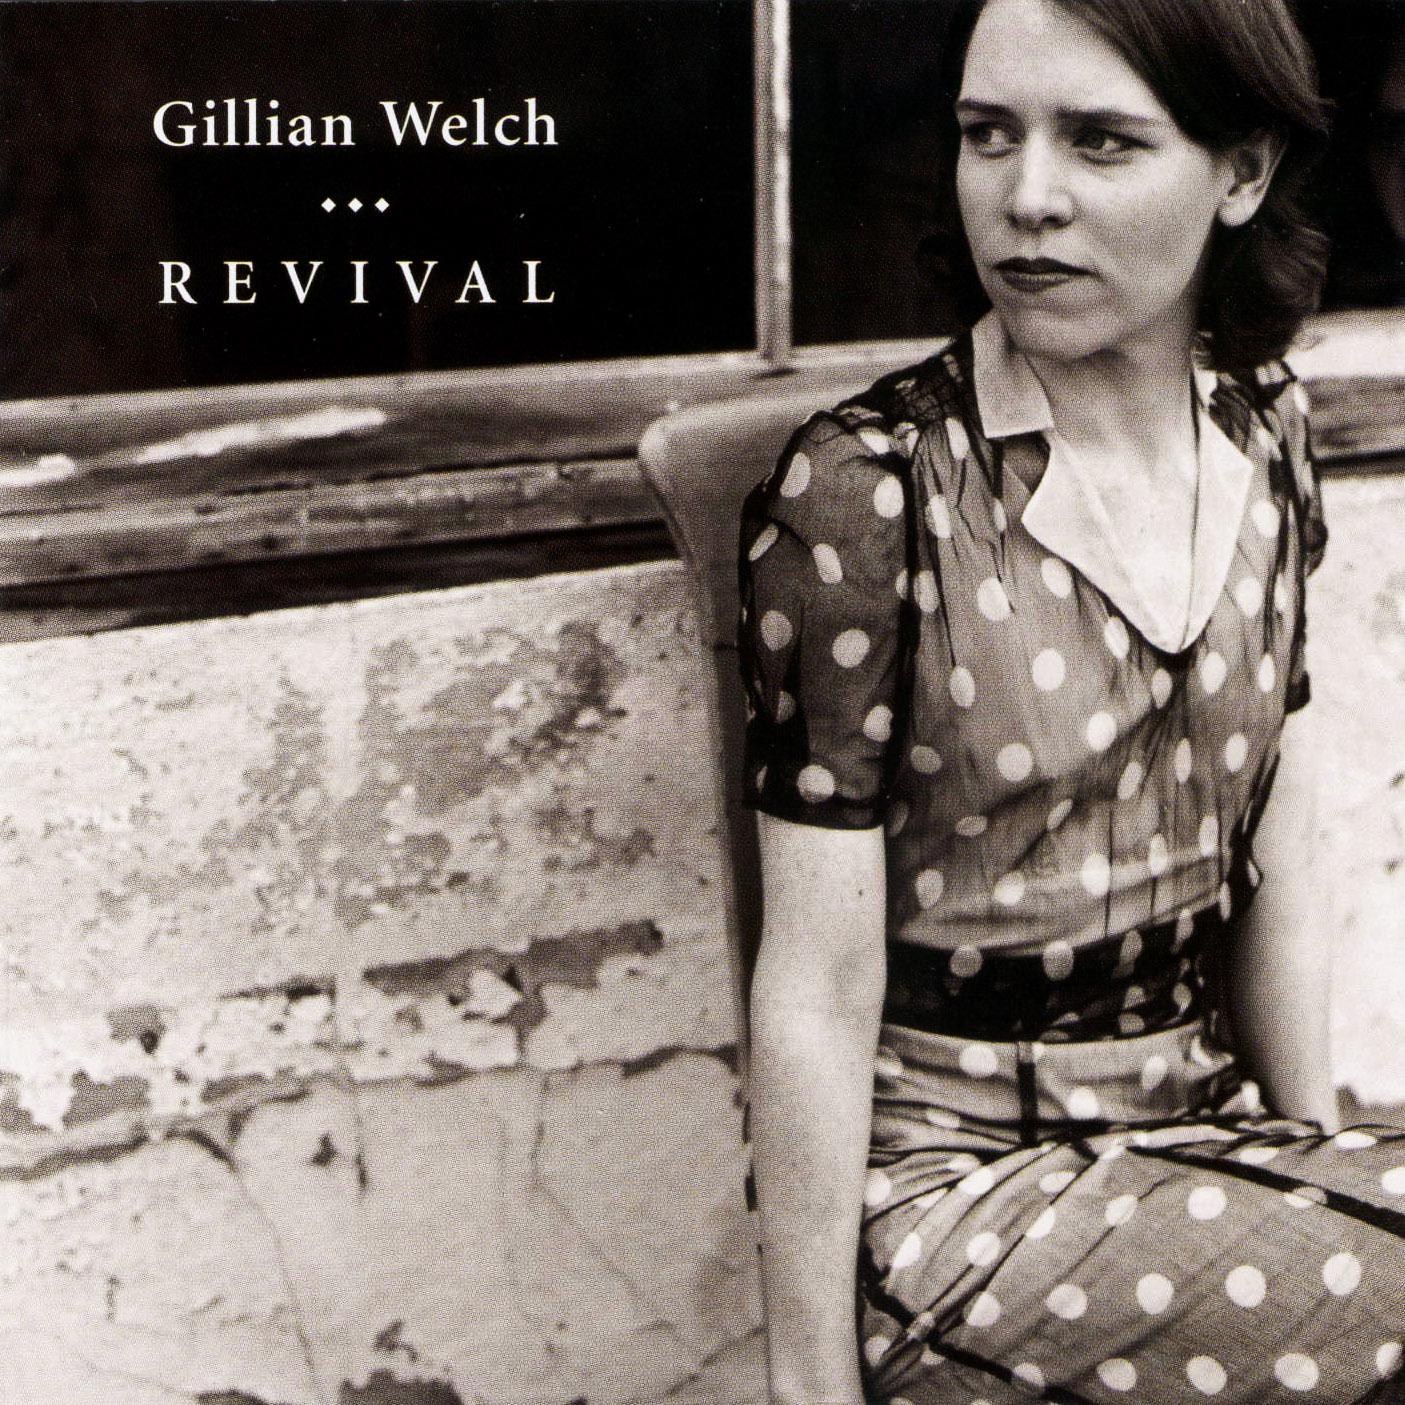 Portada de 'Revival', 1996